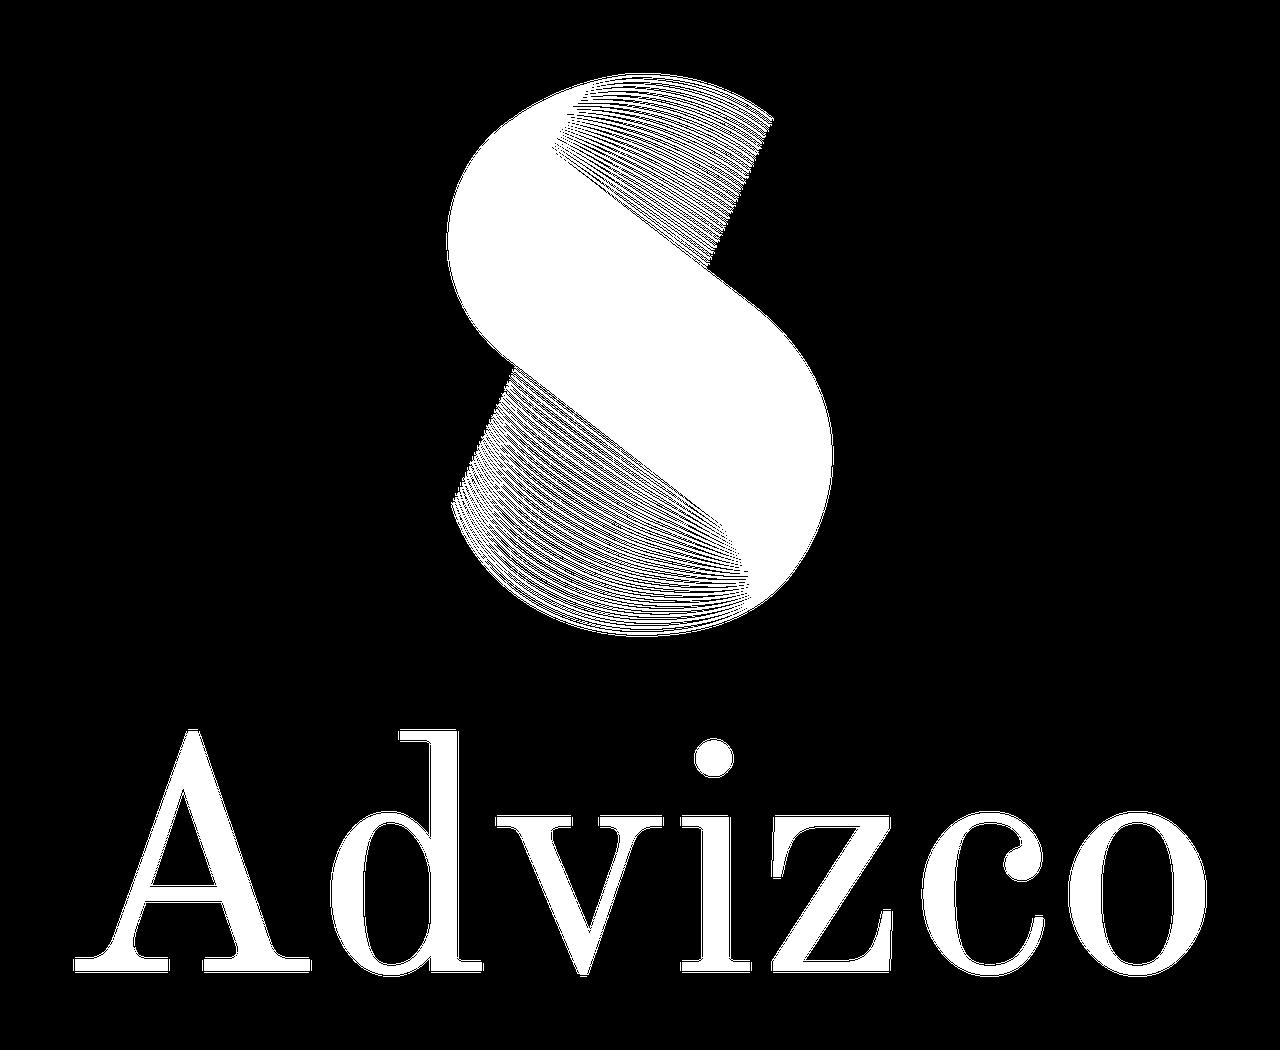 white_logo_transparent_background.png